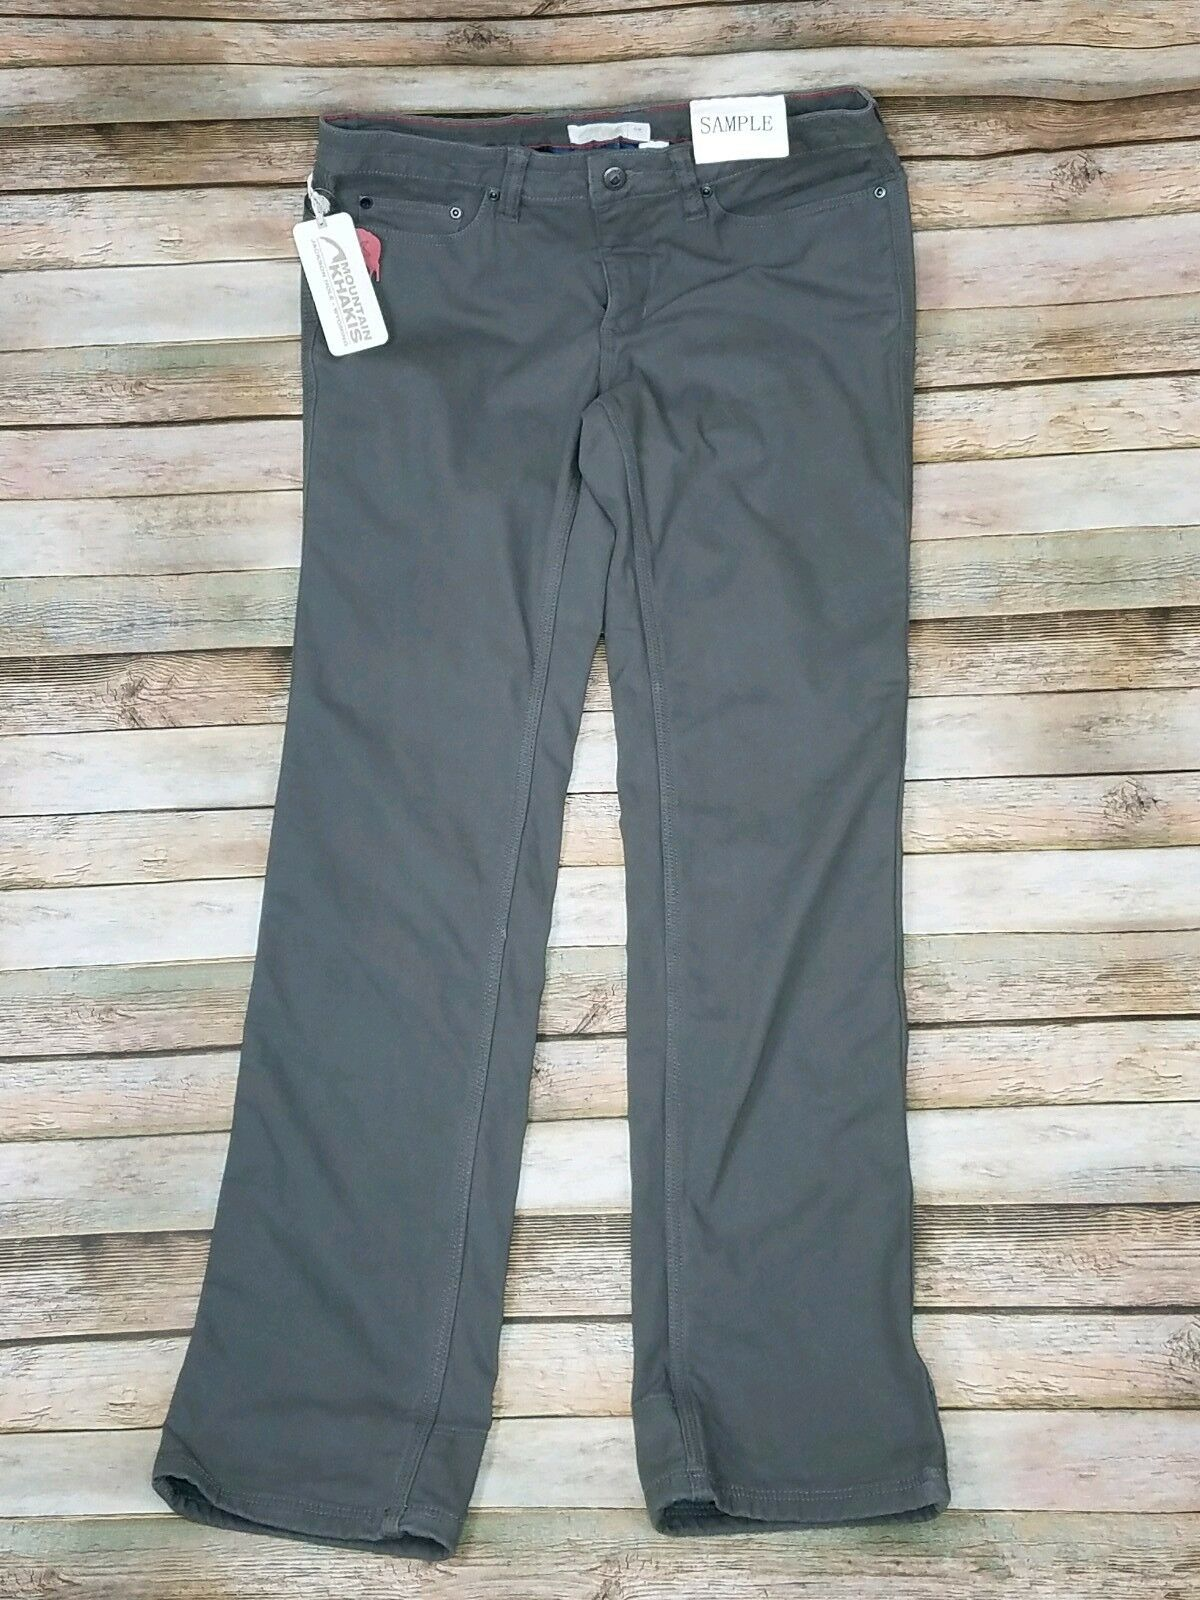 Mountain Khakis  SAMPLE  Classic Fit Mid Rise Fleece Lined Pants 6R Rare